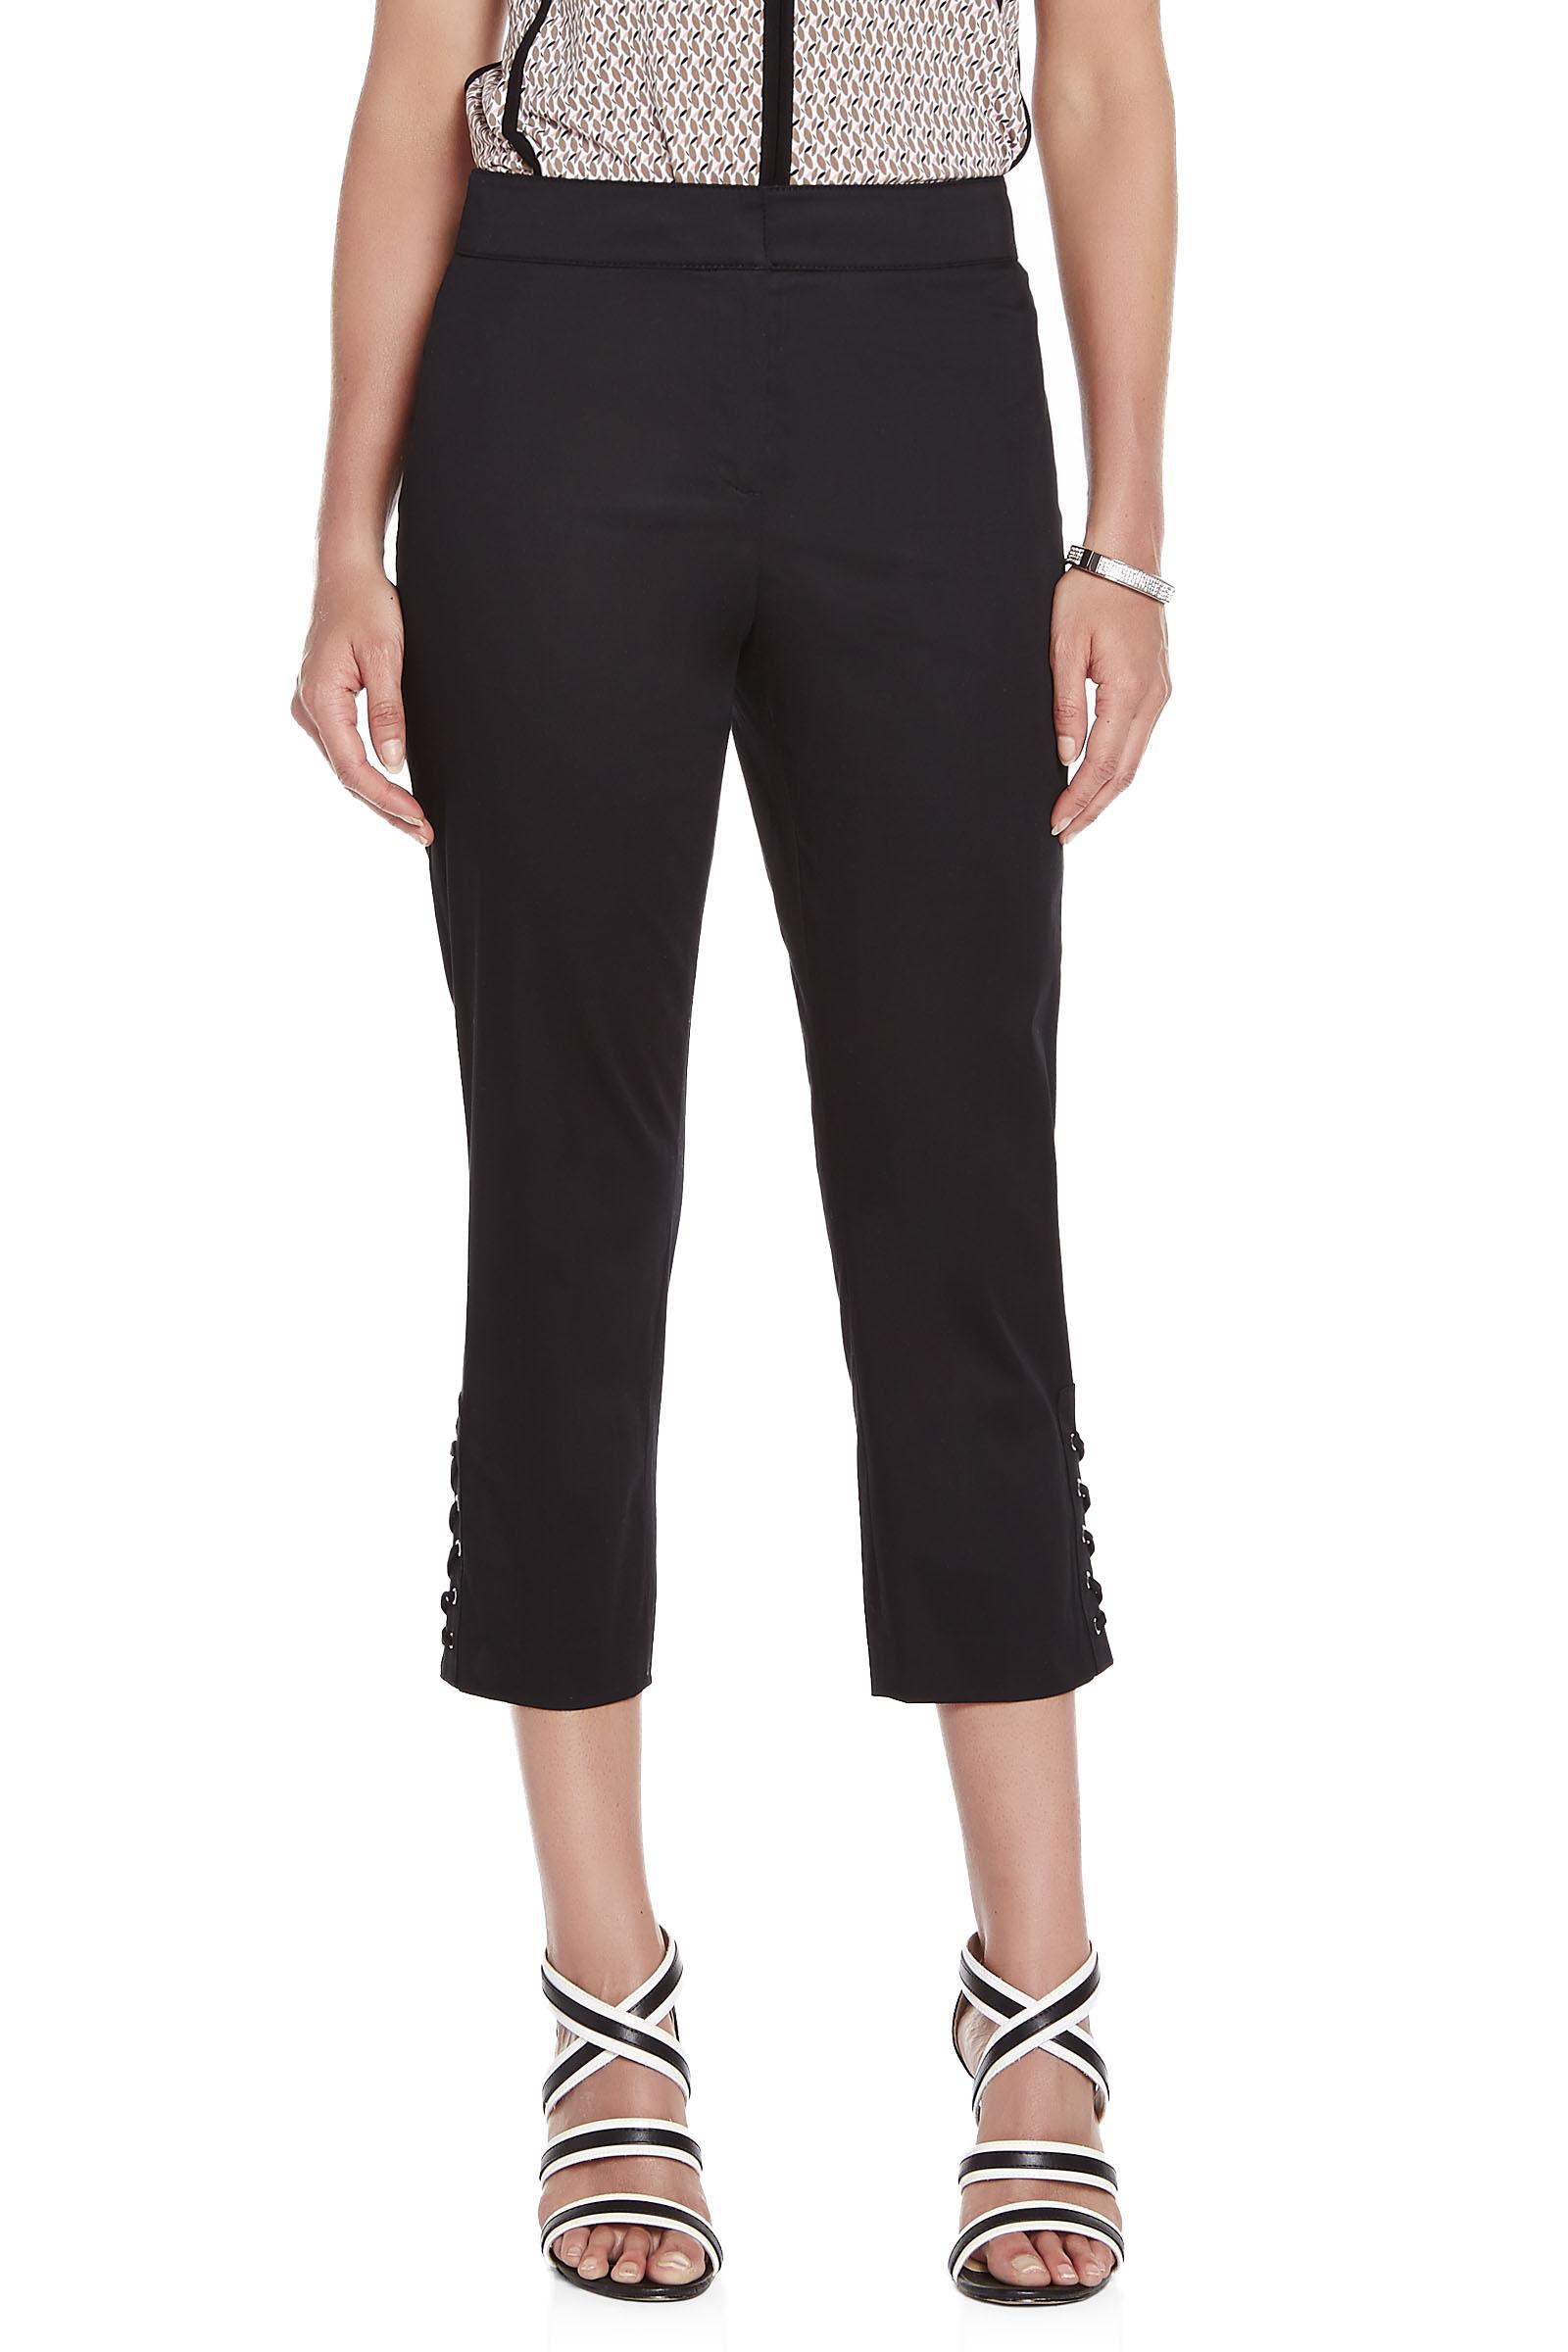 Lacing Trim Cotton Sateen Capri Pants | FREE Shipping* | Melanie Lyne